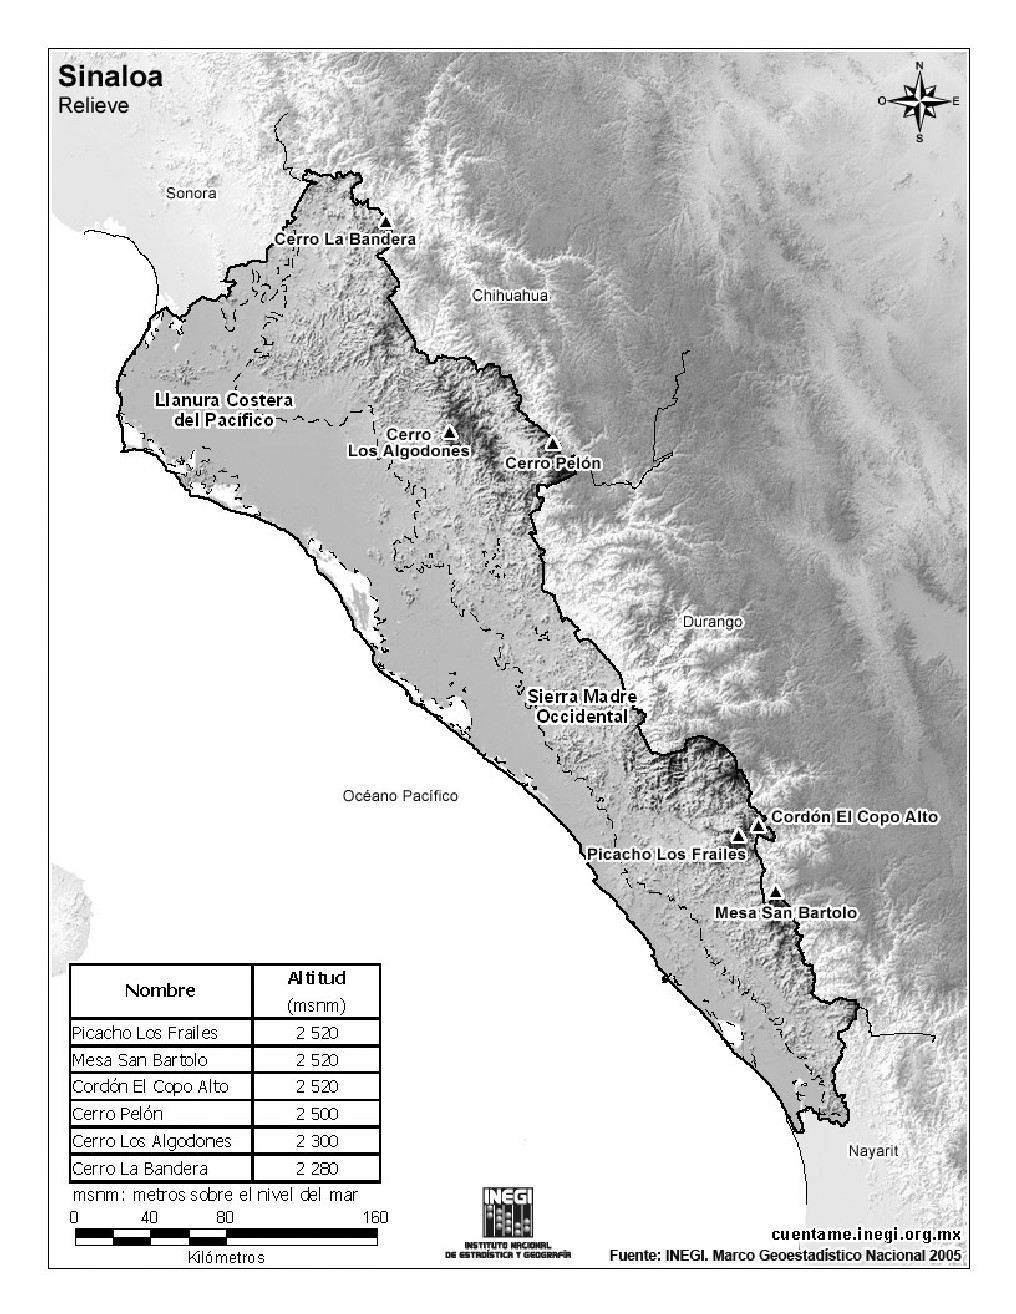 Mapa de montañas de Sinaloa. INEGI de México